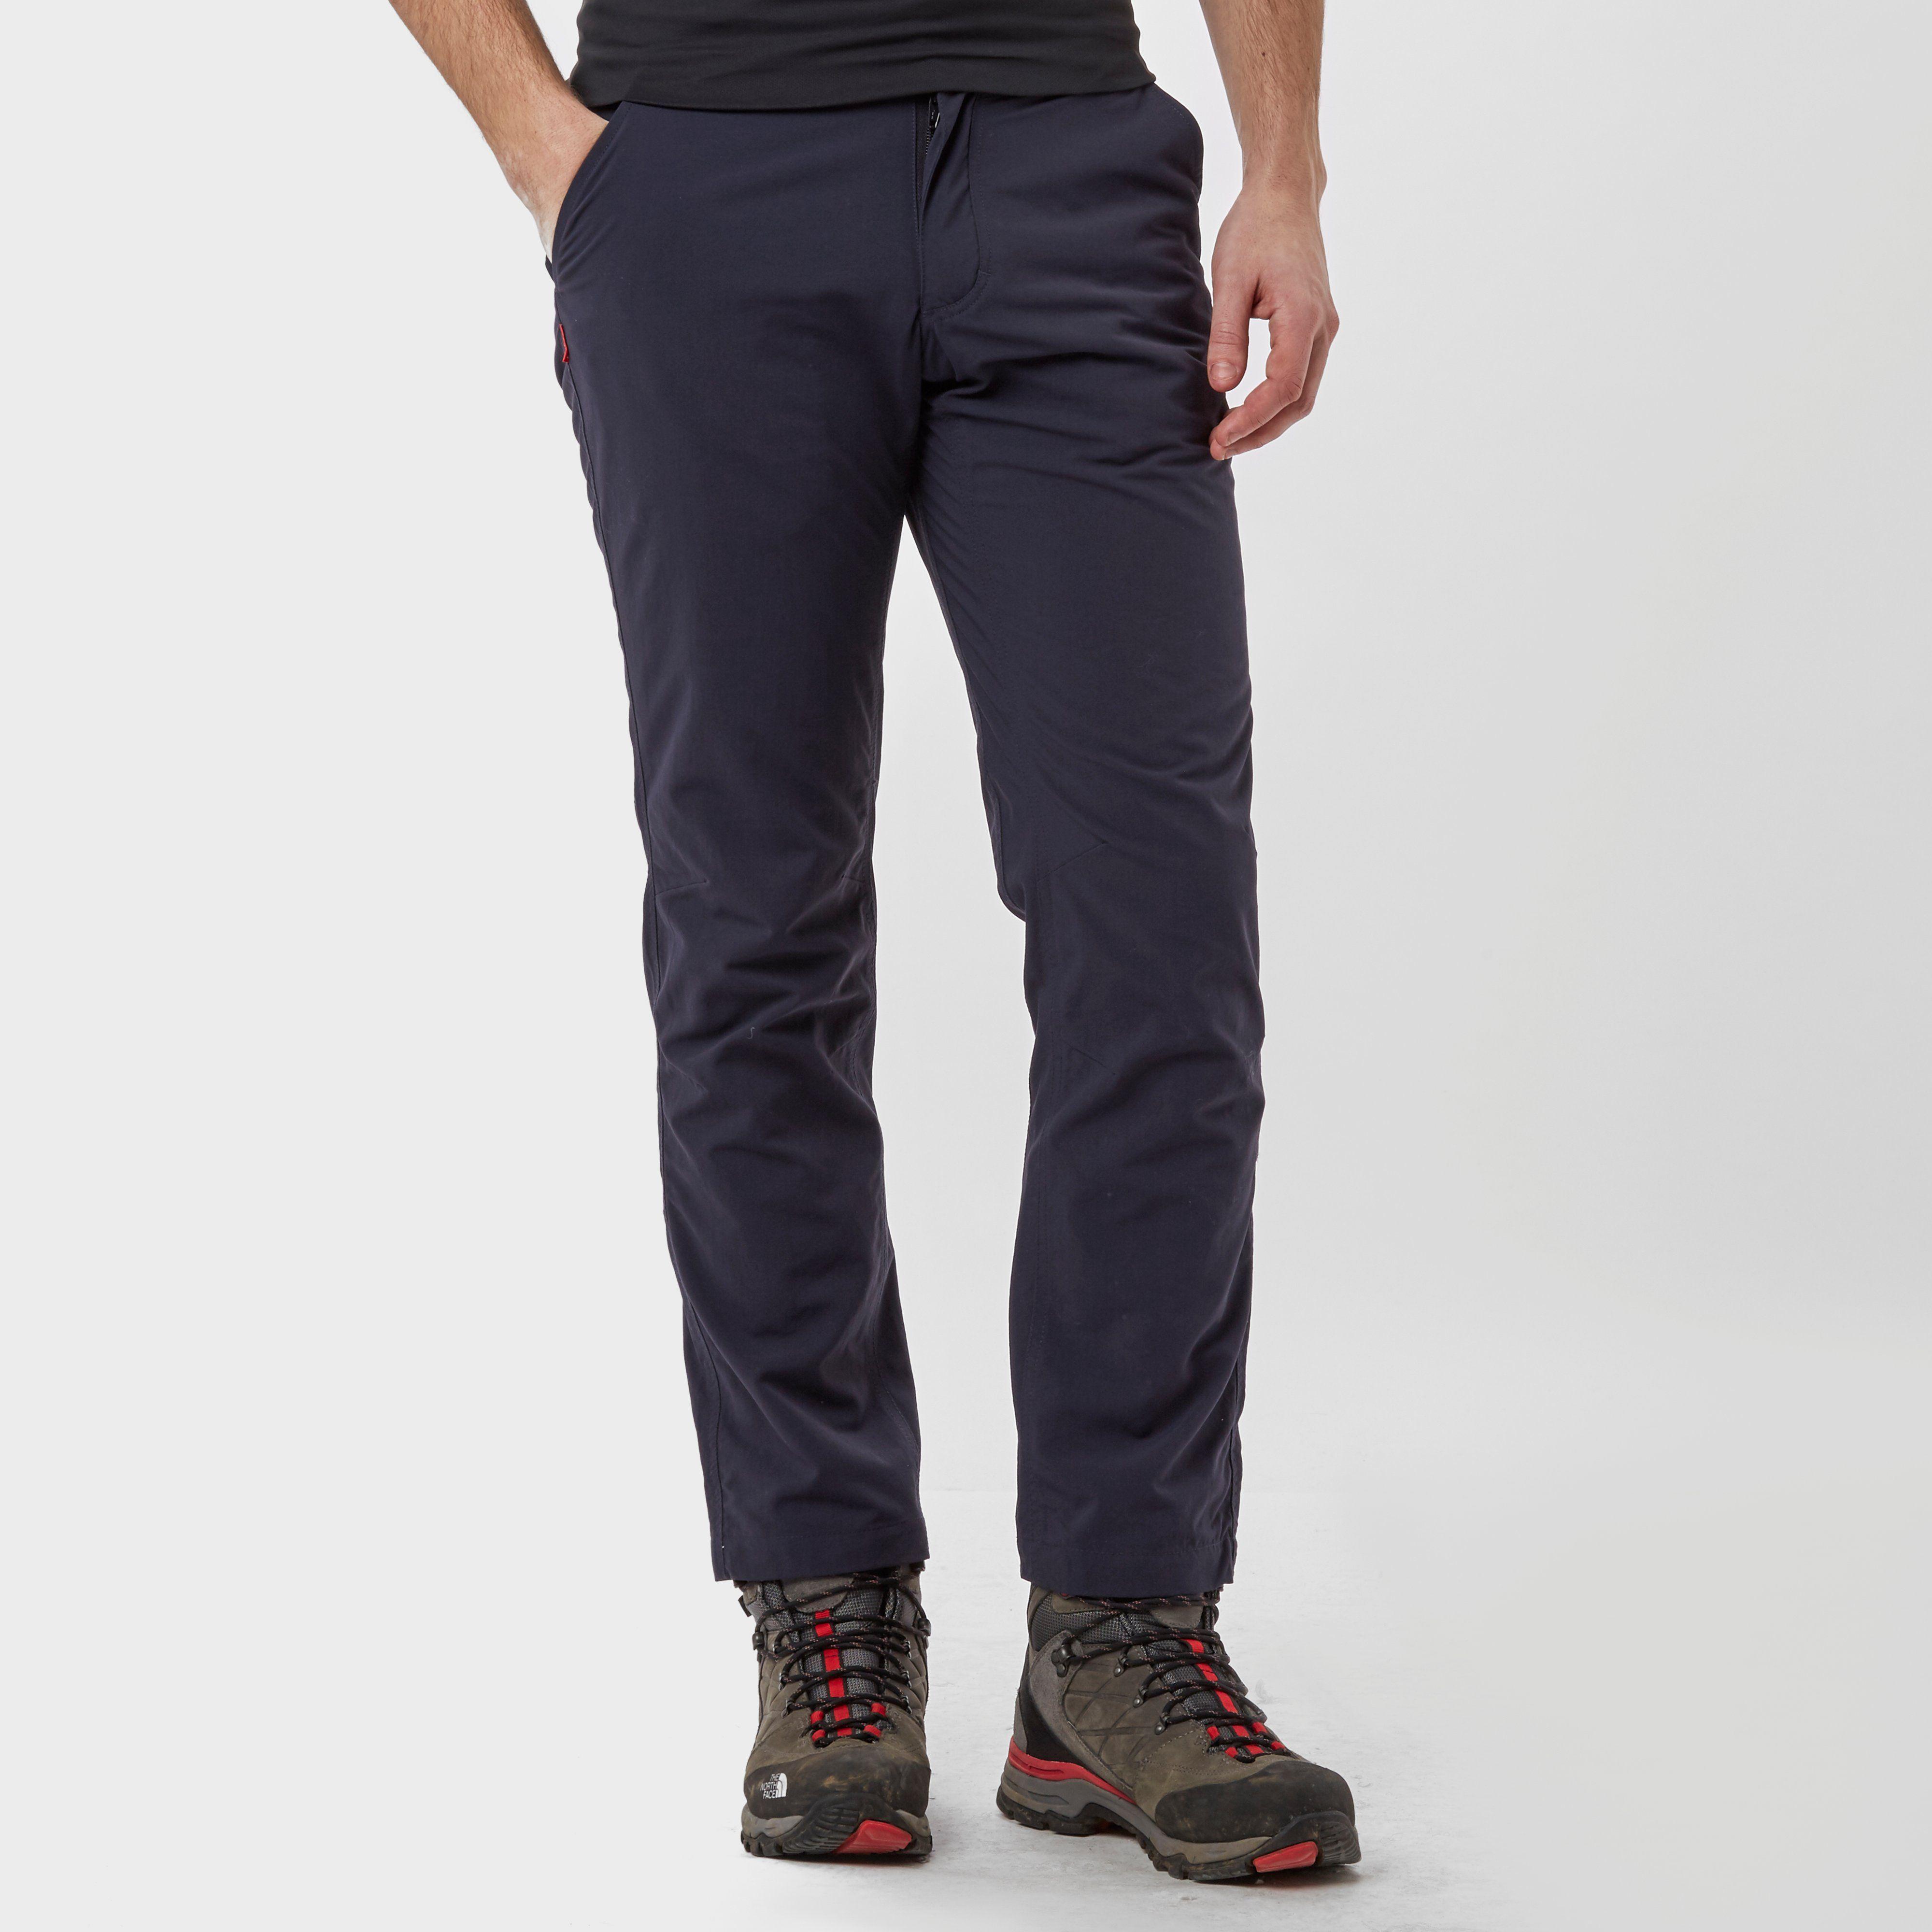 CRAGHOPPERS Men's NosiLife Mercier Trousers